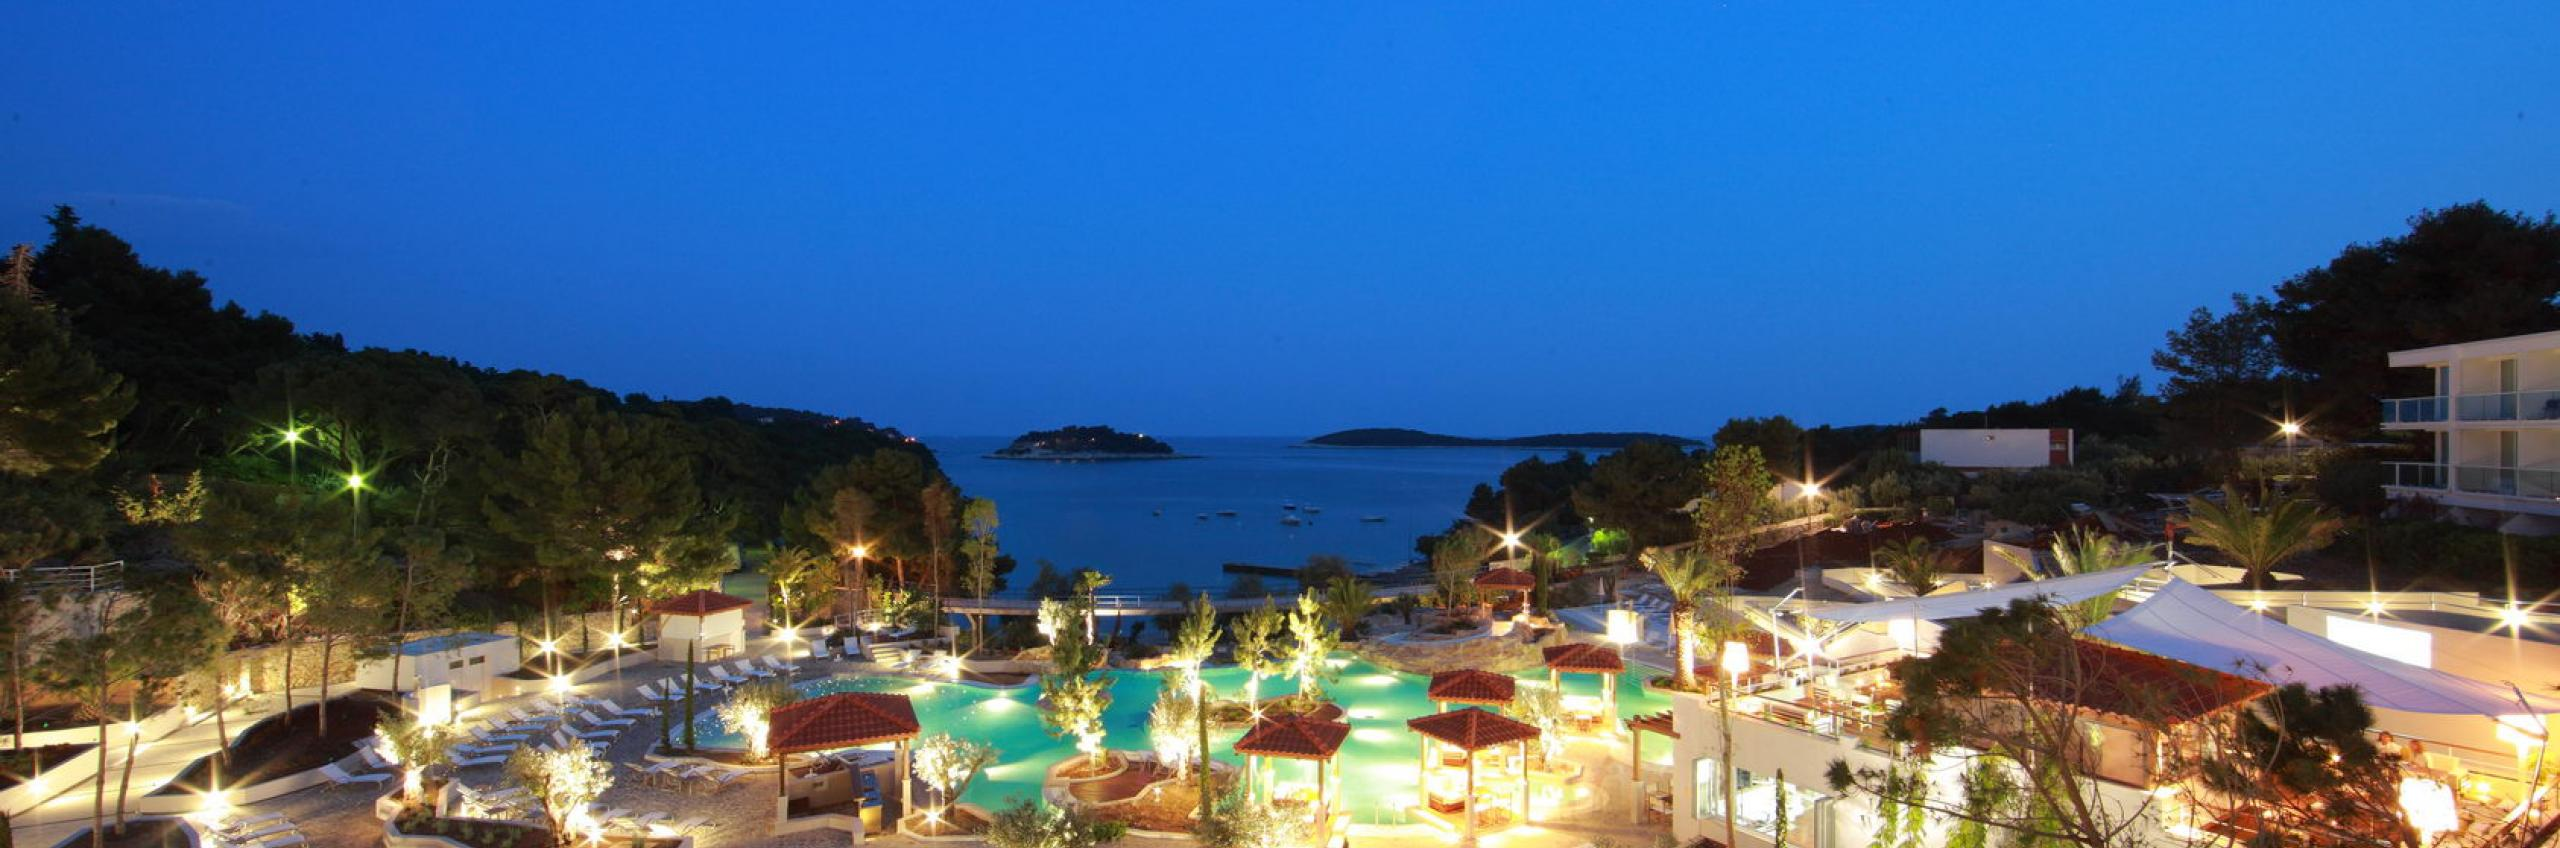 Amfora Hvar Grand Beach Resort Picture Gallery Suncani Hvar Hotels Croatia